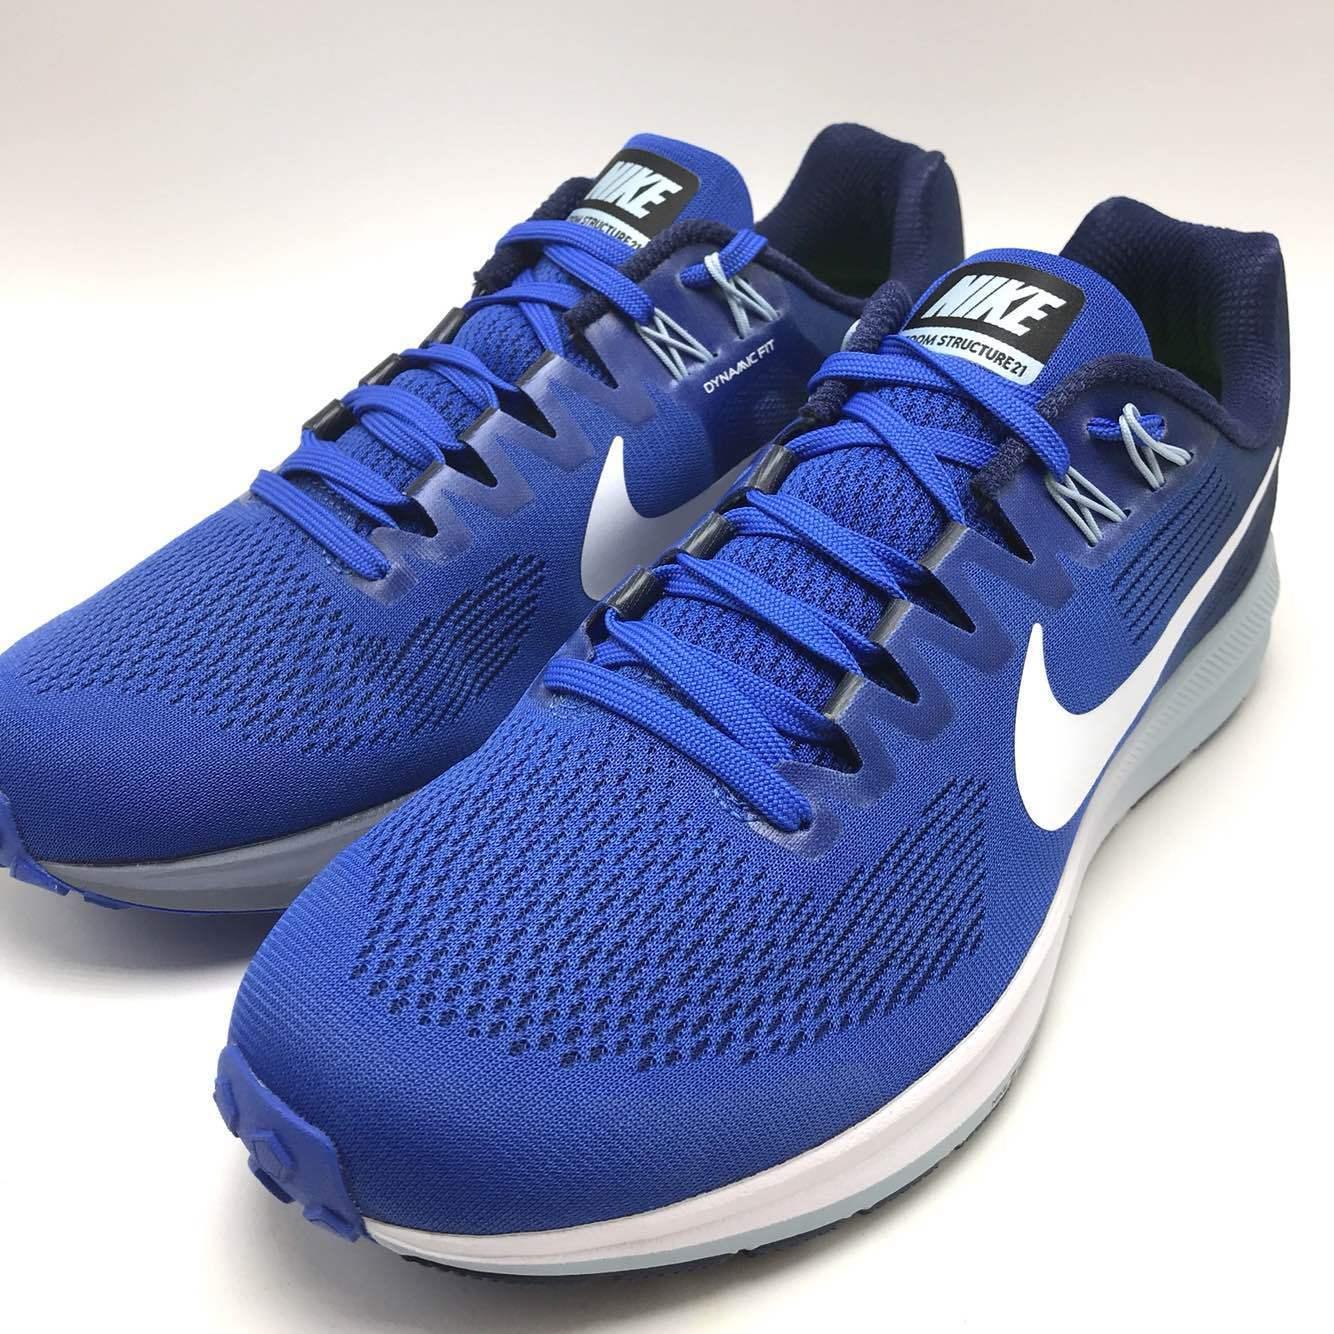 Nike Air Zoom Structure 21 Men's Running Mega bluee White-Binary bluee 904695-402